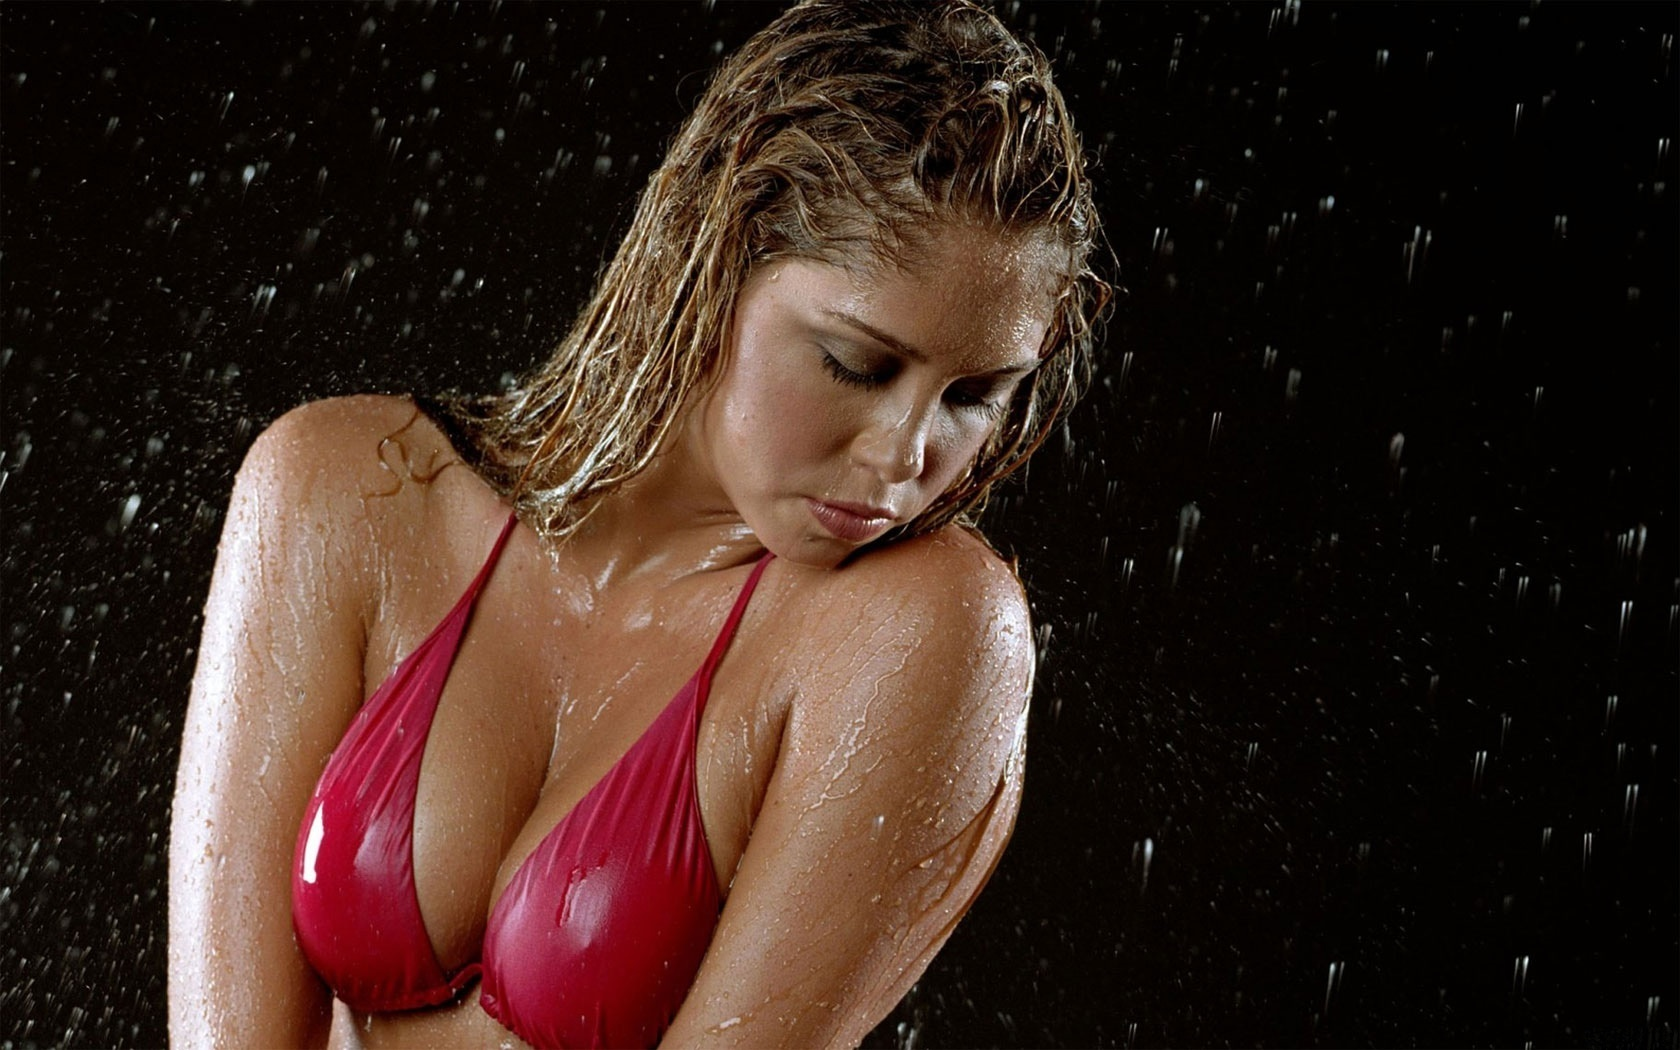 мокрые девушки фото и видео ним может